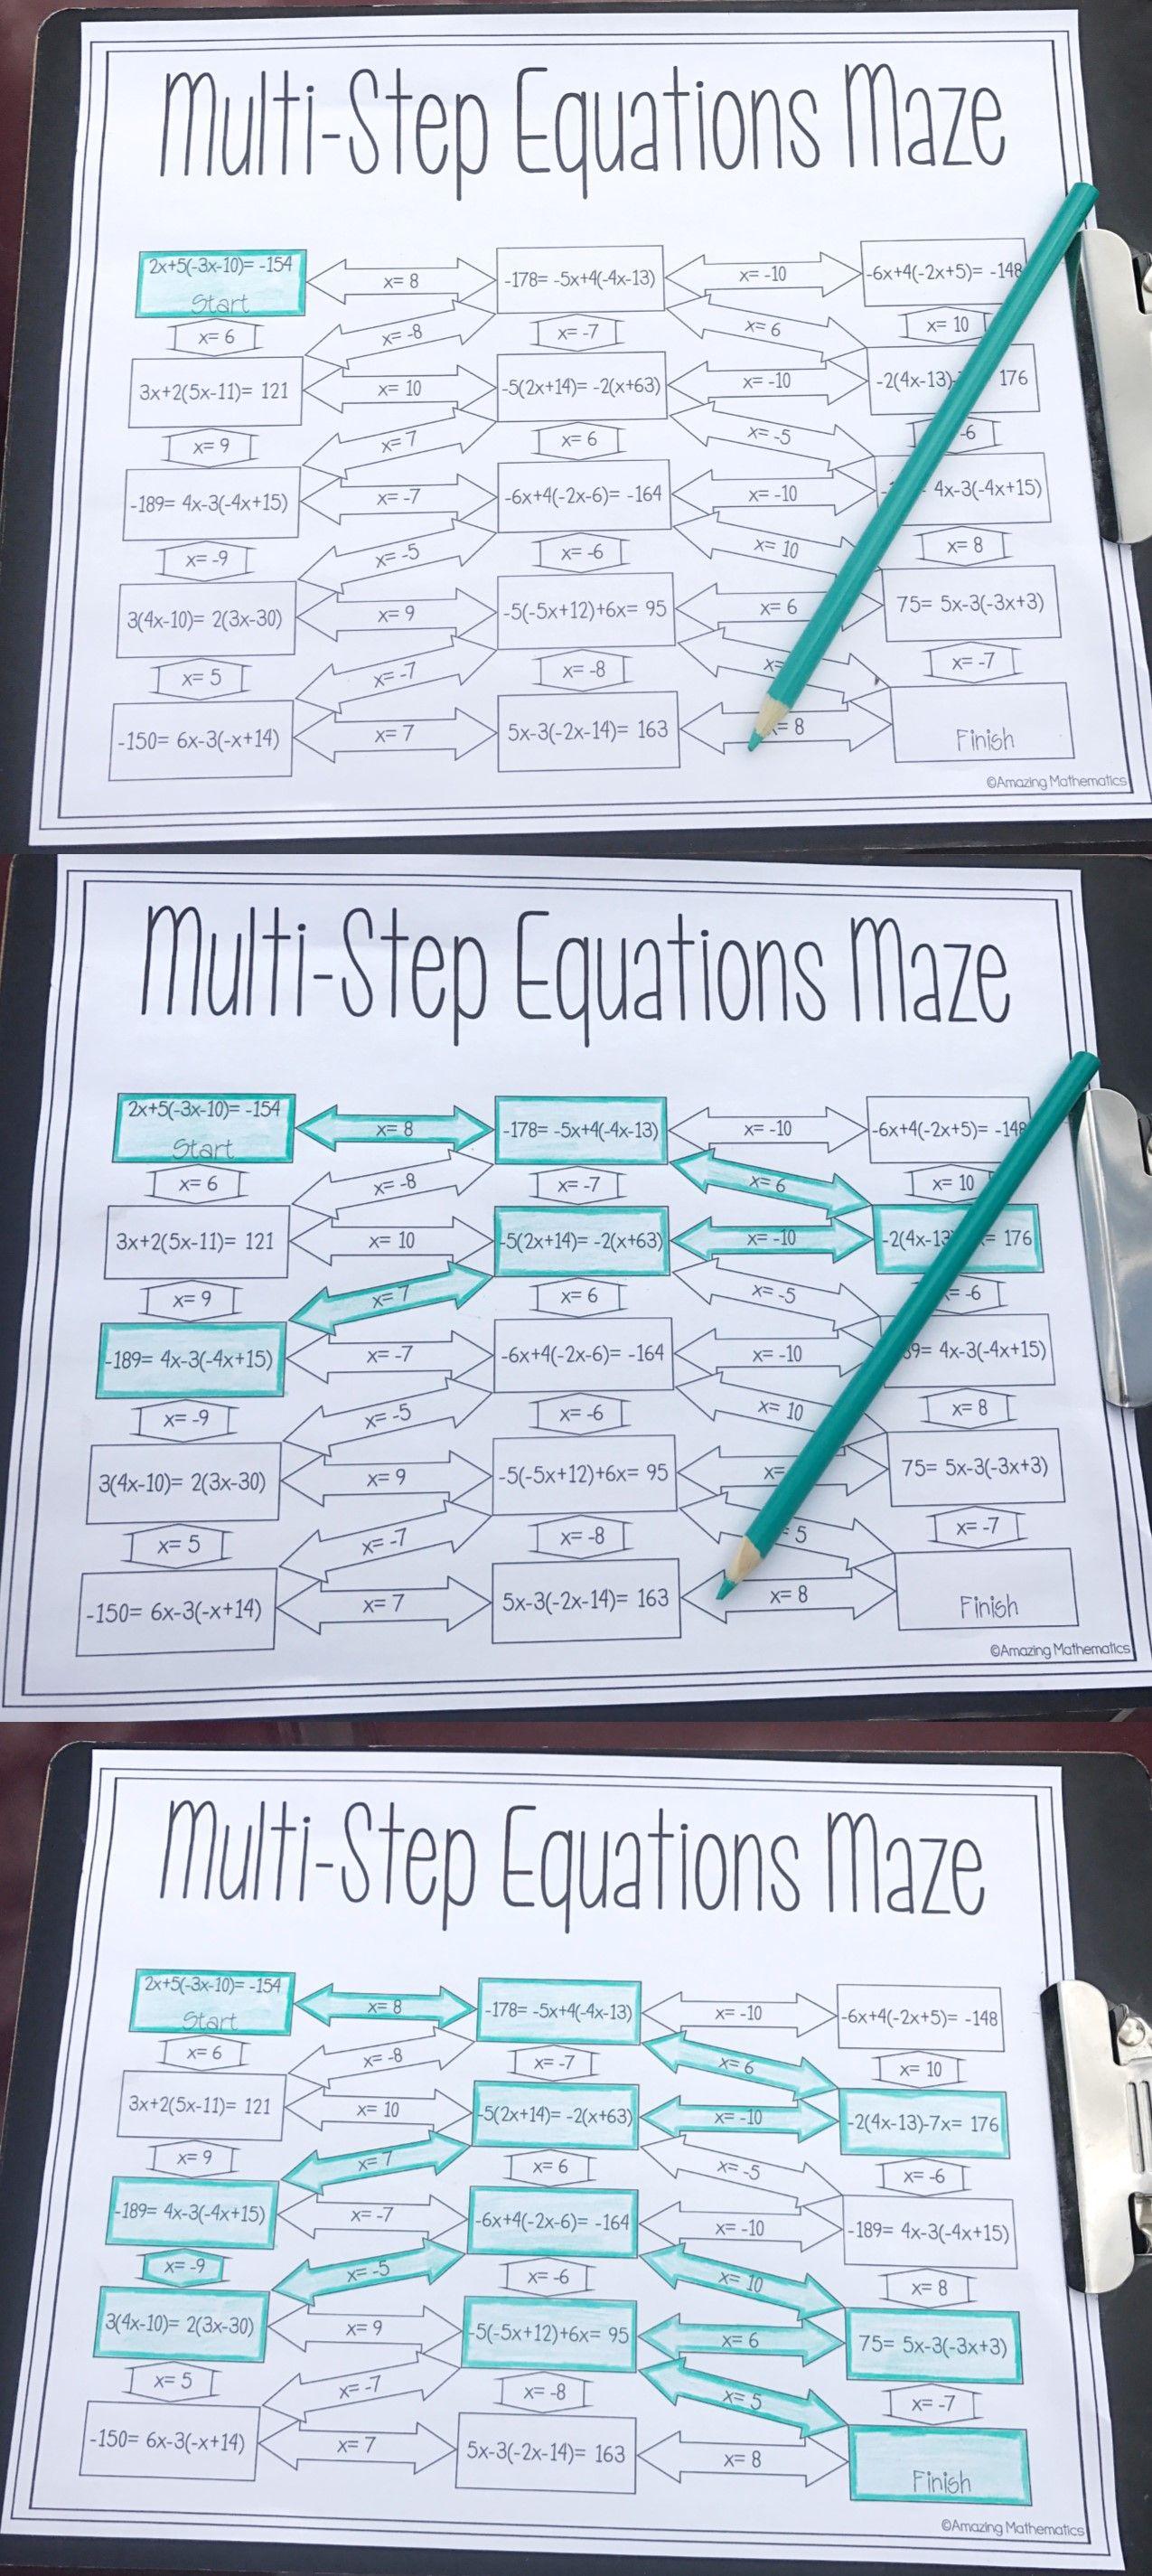 medium resolution of Solving Multi-Step Equations Worksheet - Maze Activity   Middle school math  worksheets